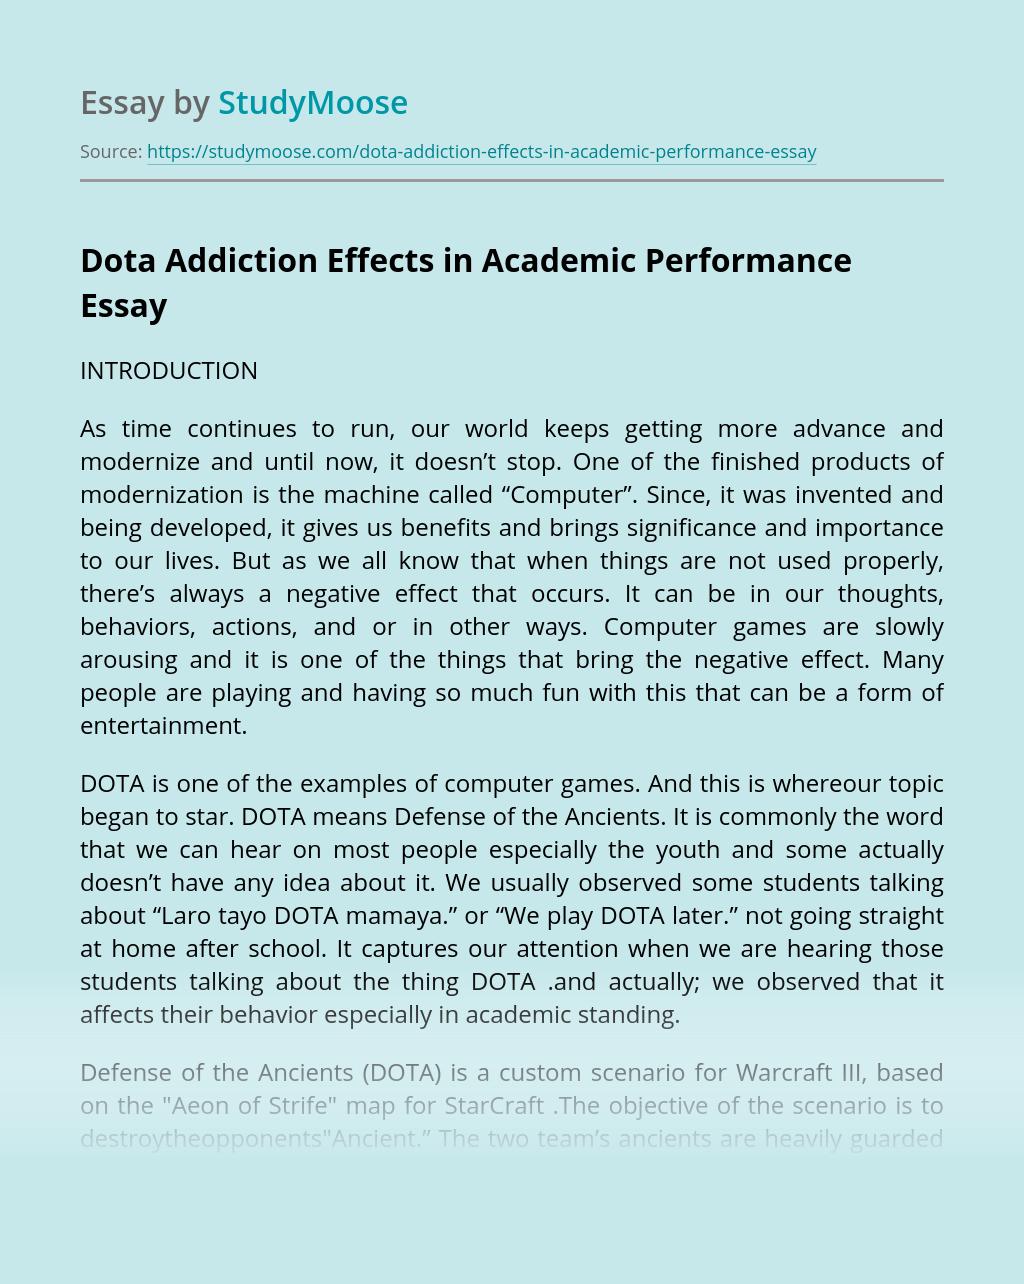 Dota Addiction Effects in Academic Performance